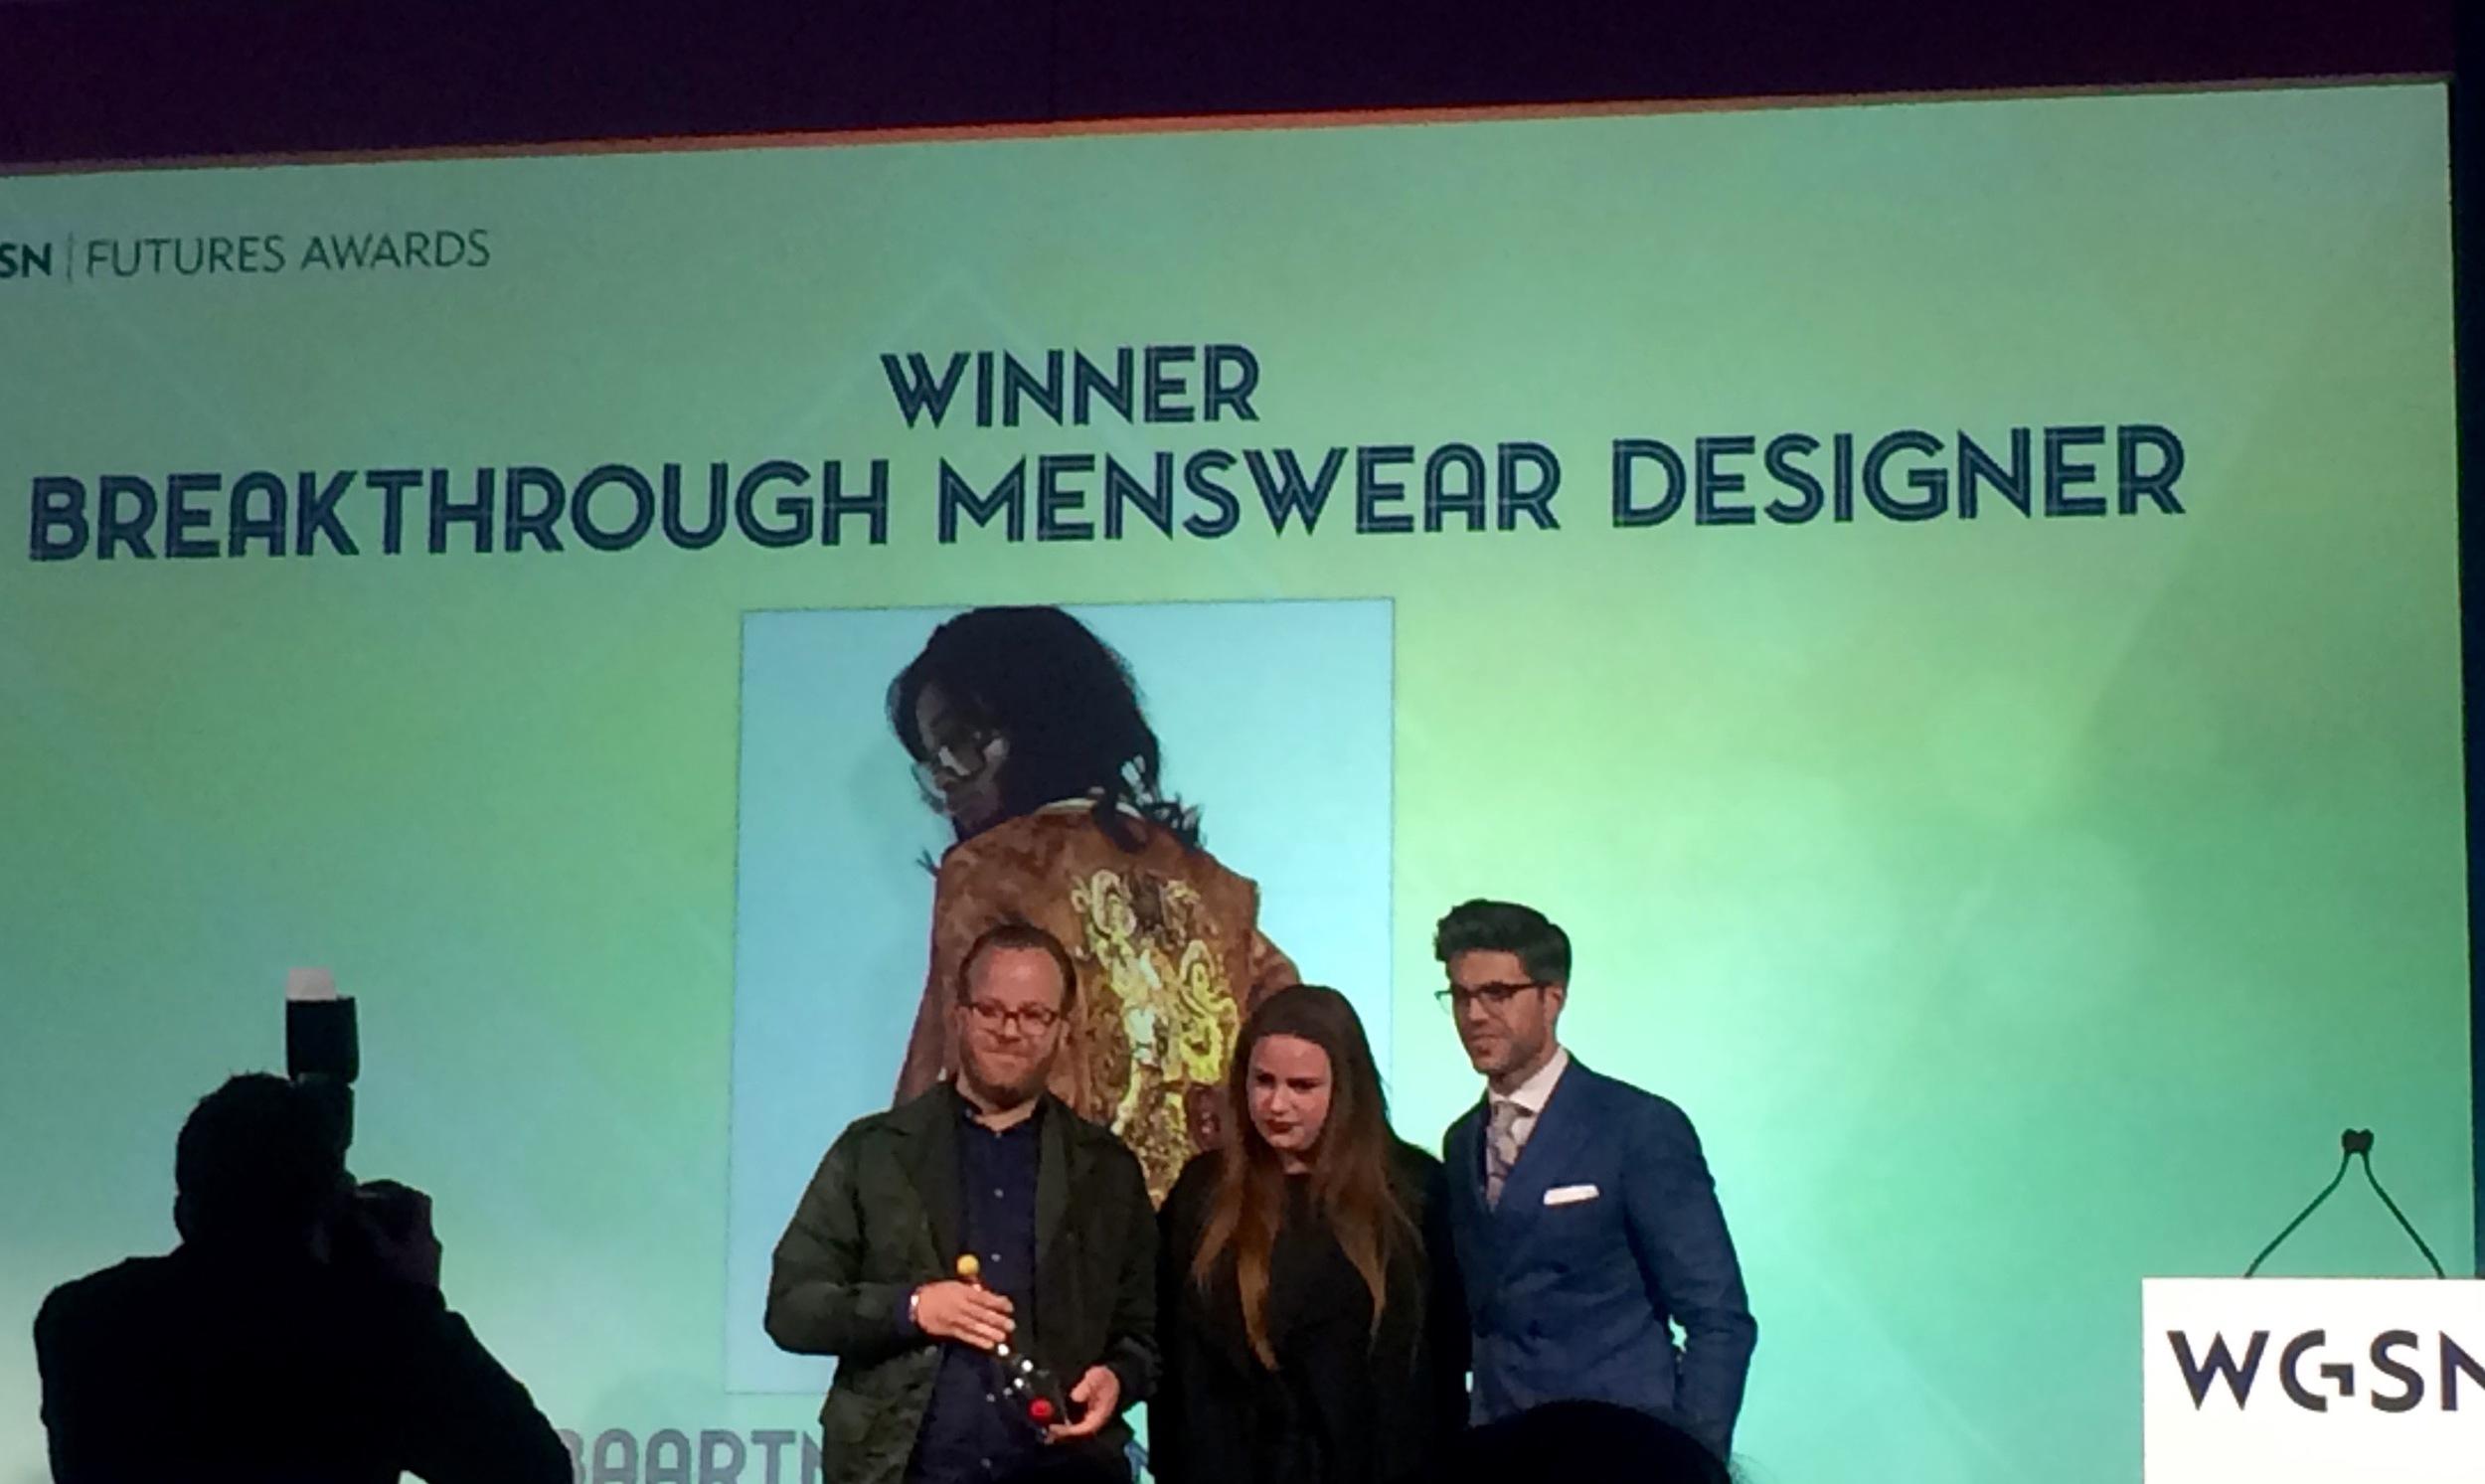 One of my favourite menswear designers Baartmans and Siegel WGSN Winner